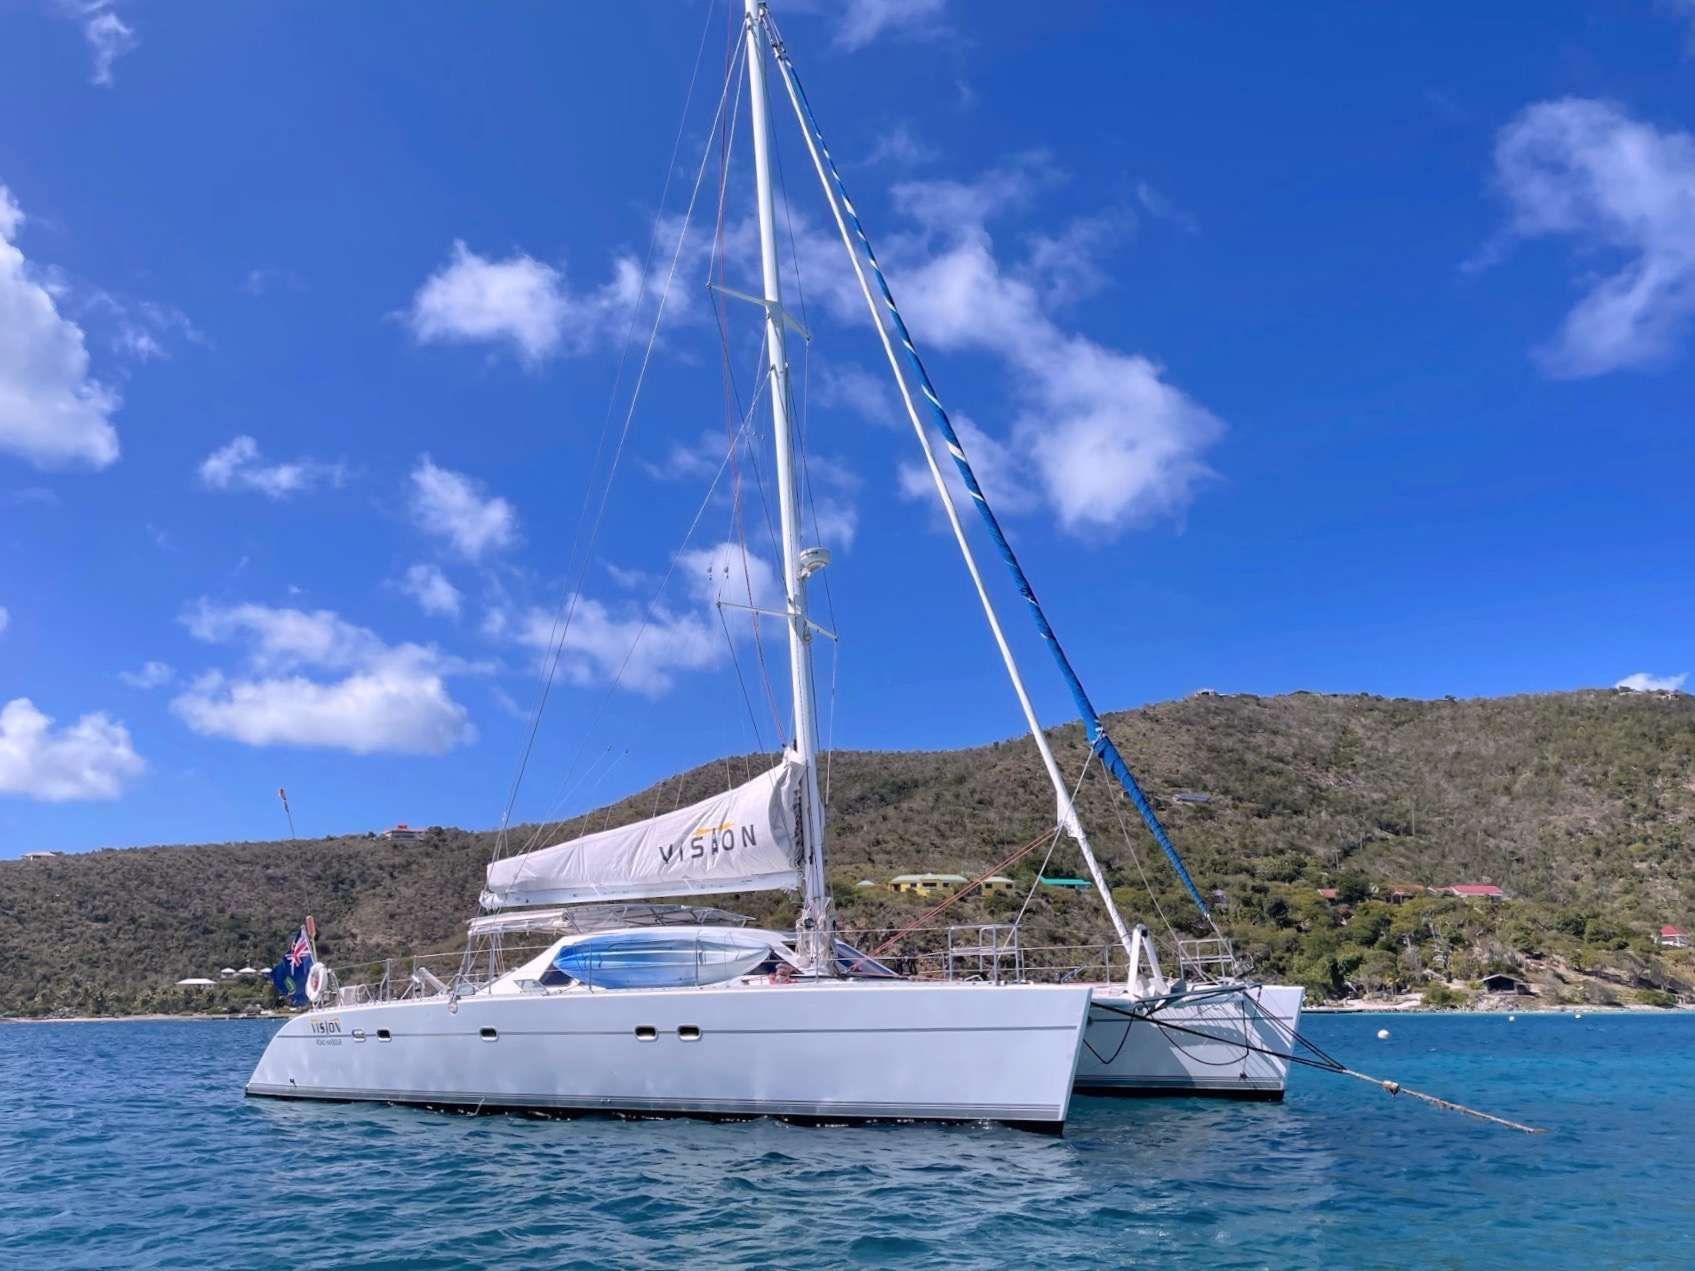 VISION - Lagoon 57 - 4 Cabins - Nanny Cay Tortola - Beef Island - Virgin Gorda